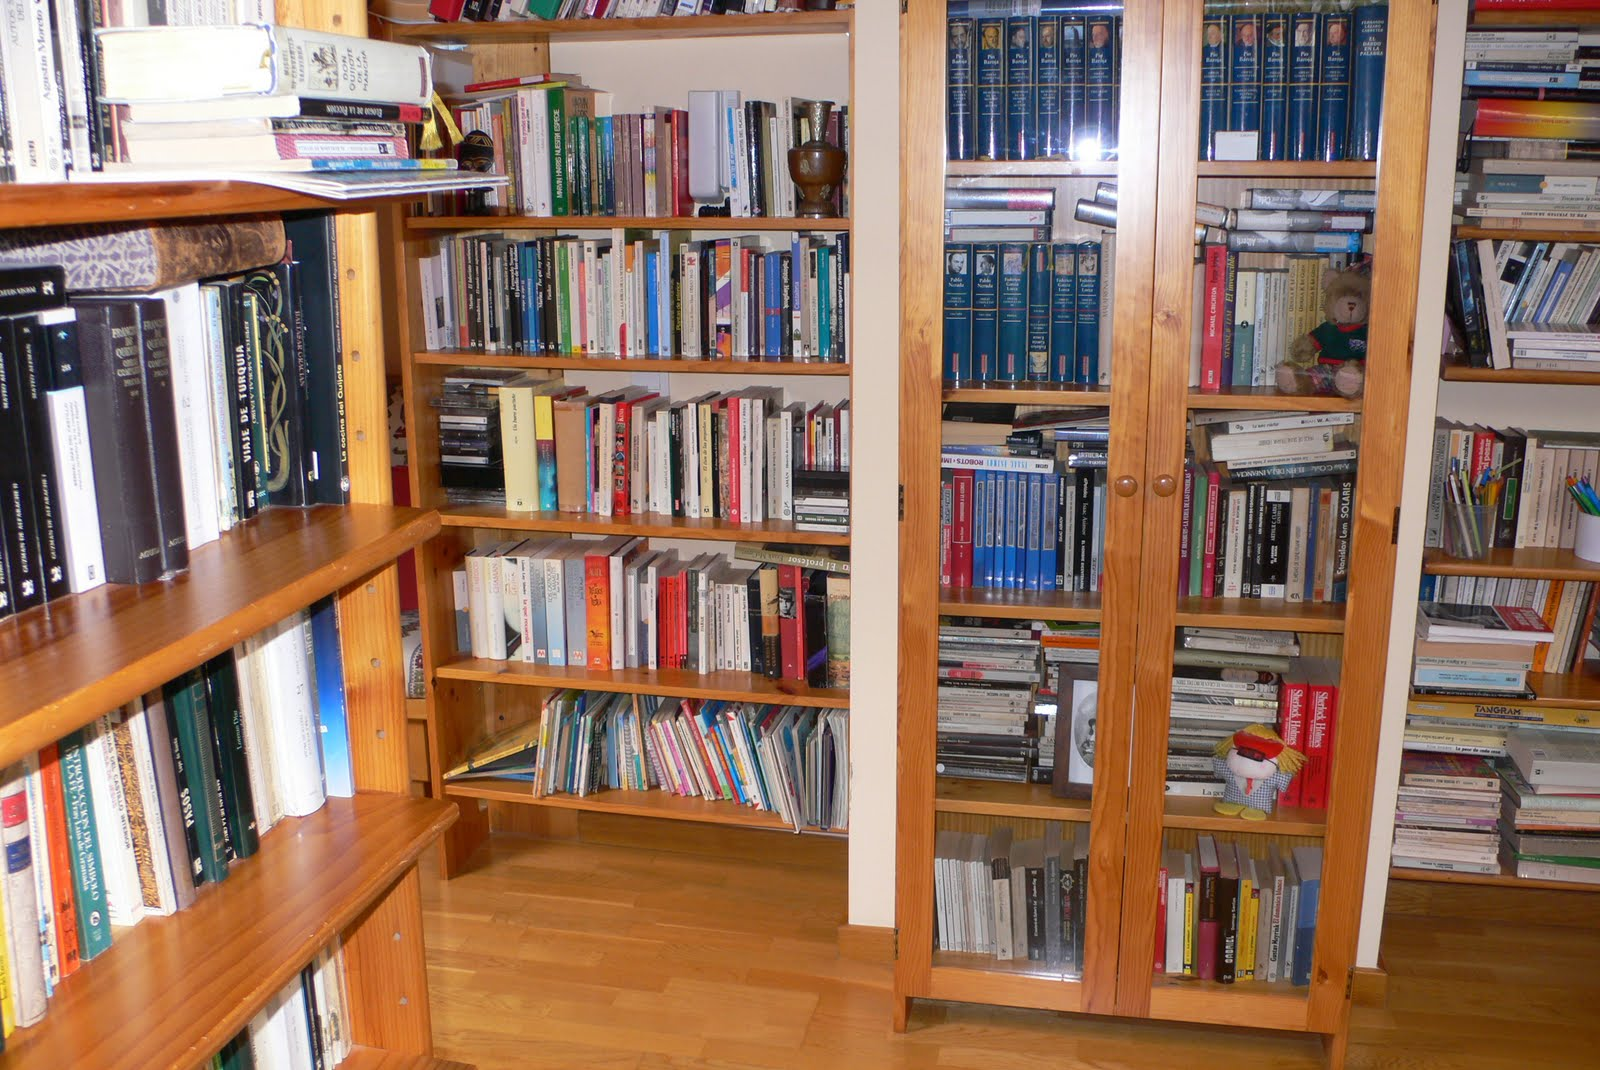 PROFESOR EN LA SECUNDARIA: Mi biblioteca